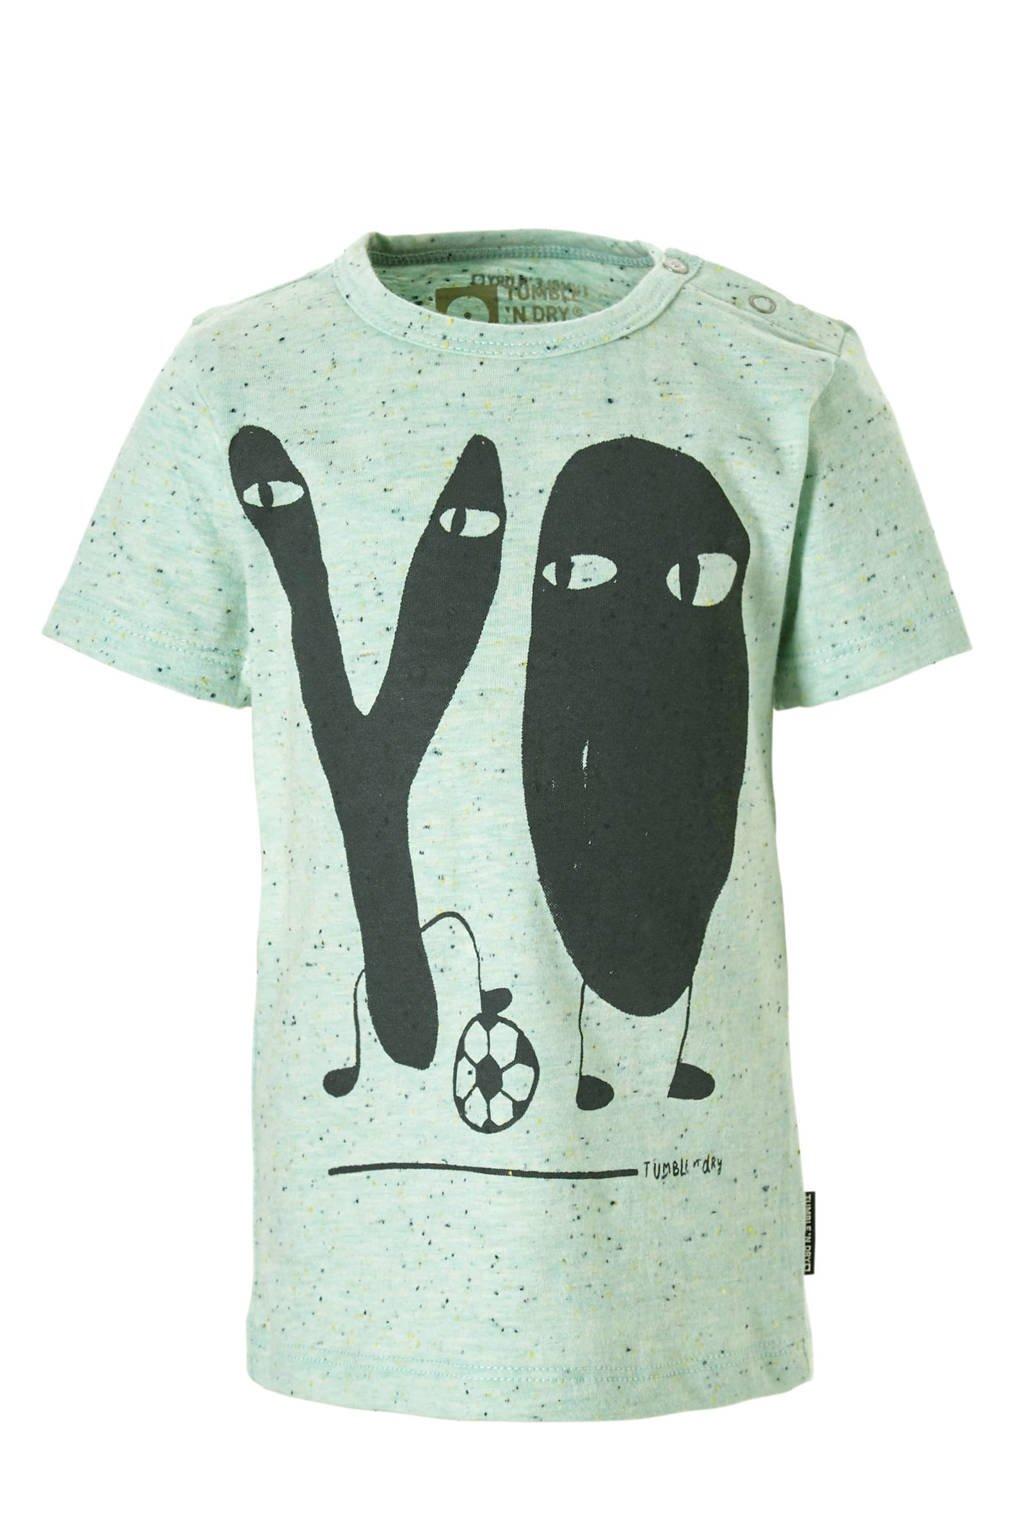 Tumble 'n Dry Lo T-shirt Agner met printopdruk mint, Mintgroen